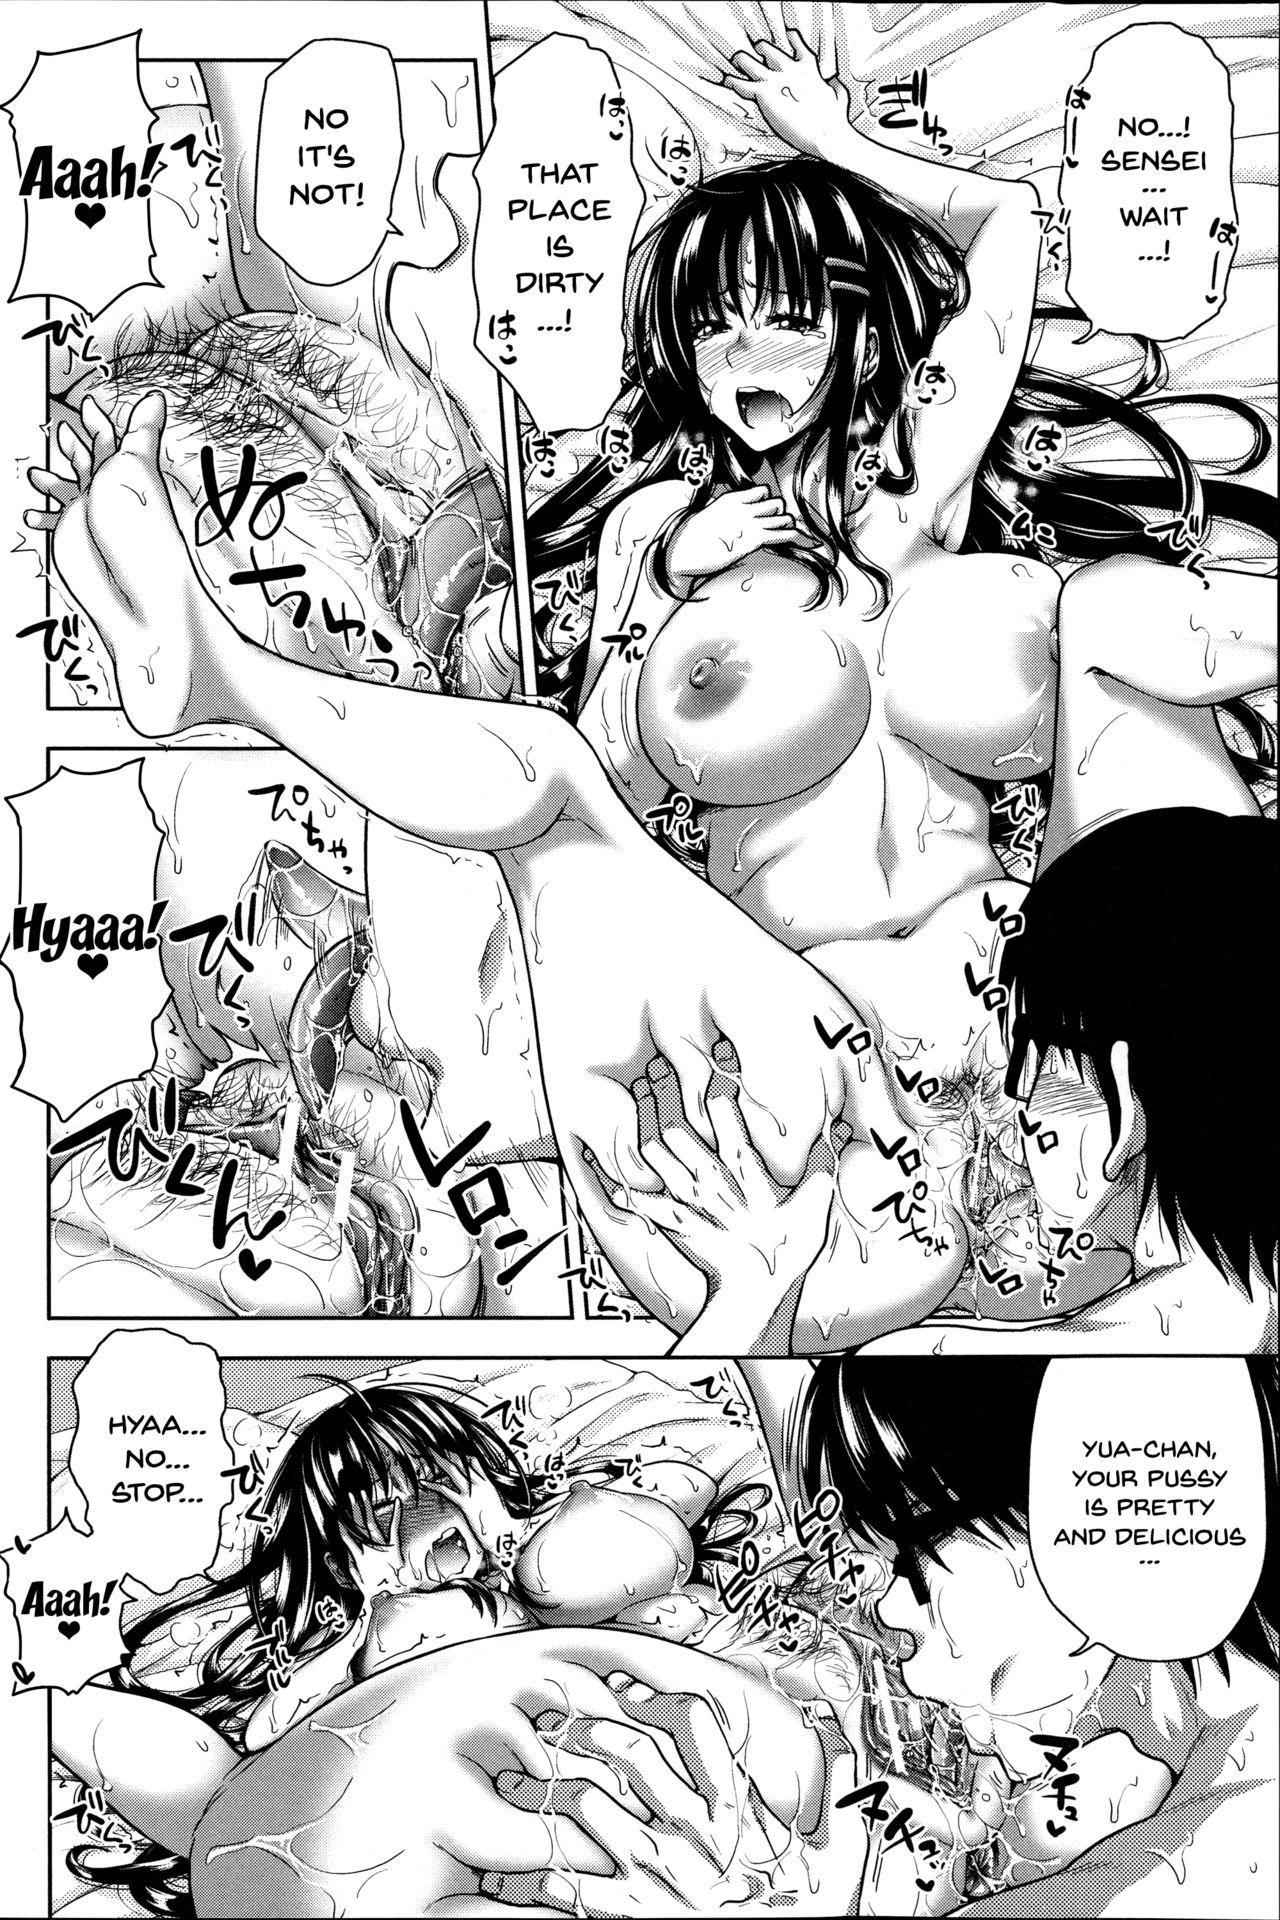 Pakotate! Seikouritsu 0% no Teppeki Bishojo VS Seikouritsu 100% no Hentai Katei Kyoushi   Pakotate! Sex Rate 0% Iron-Willed Beautiful Virgins VS Sex Rate 100% Perverted Coach 147